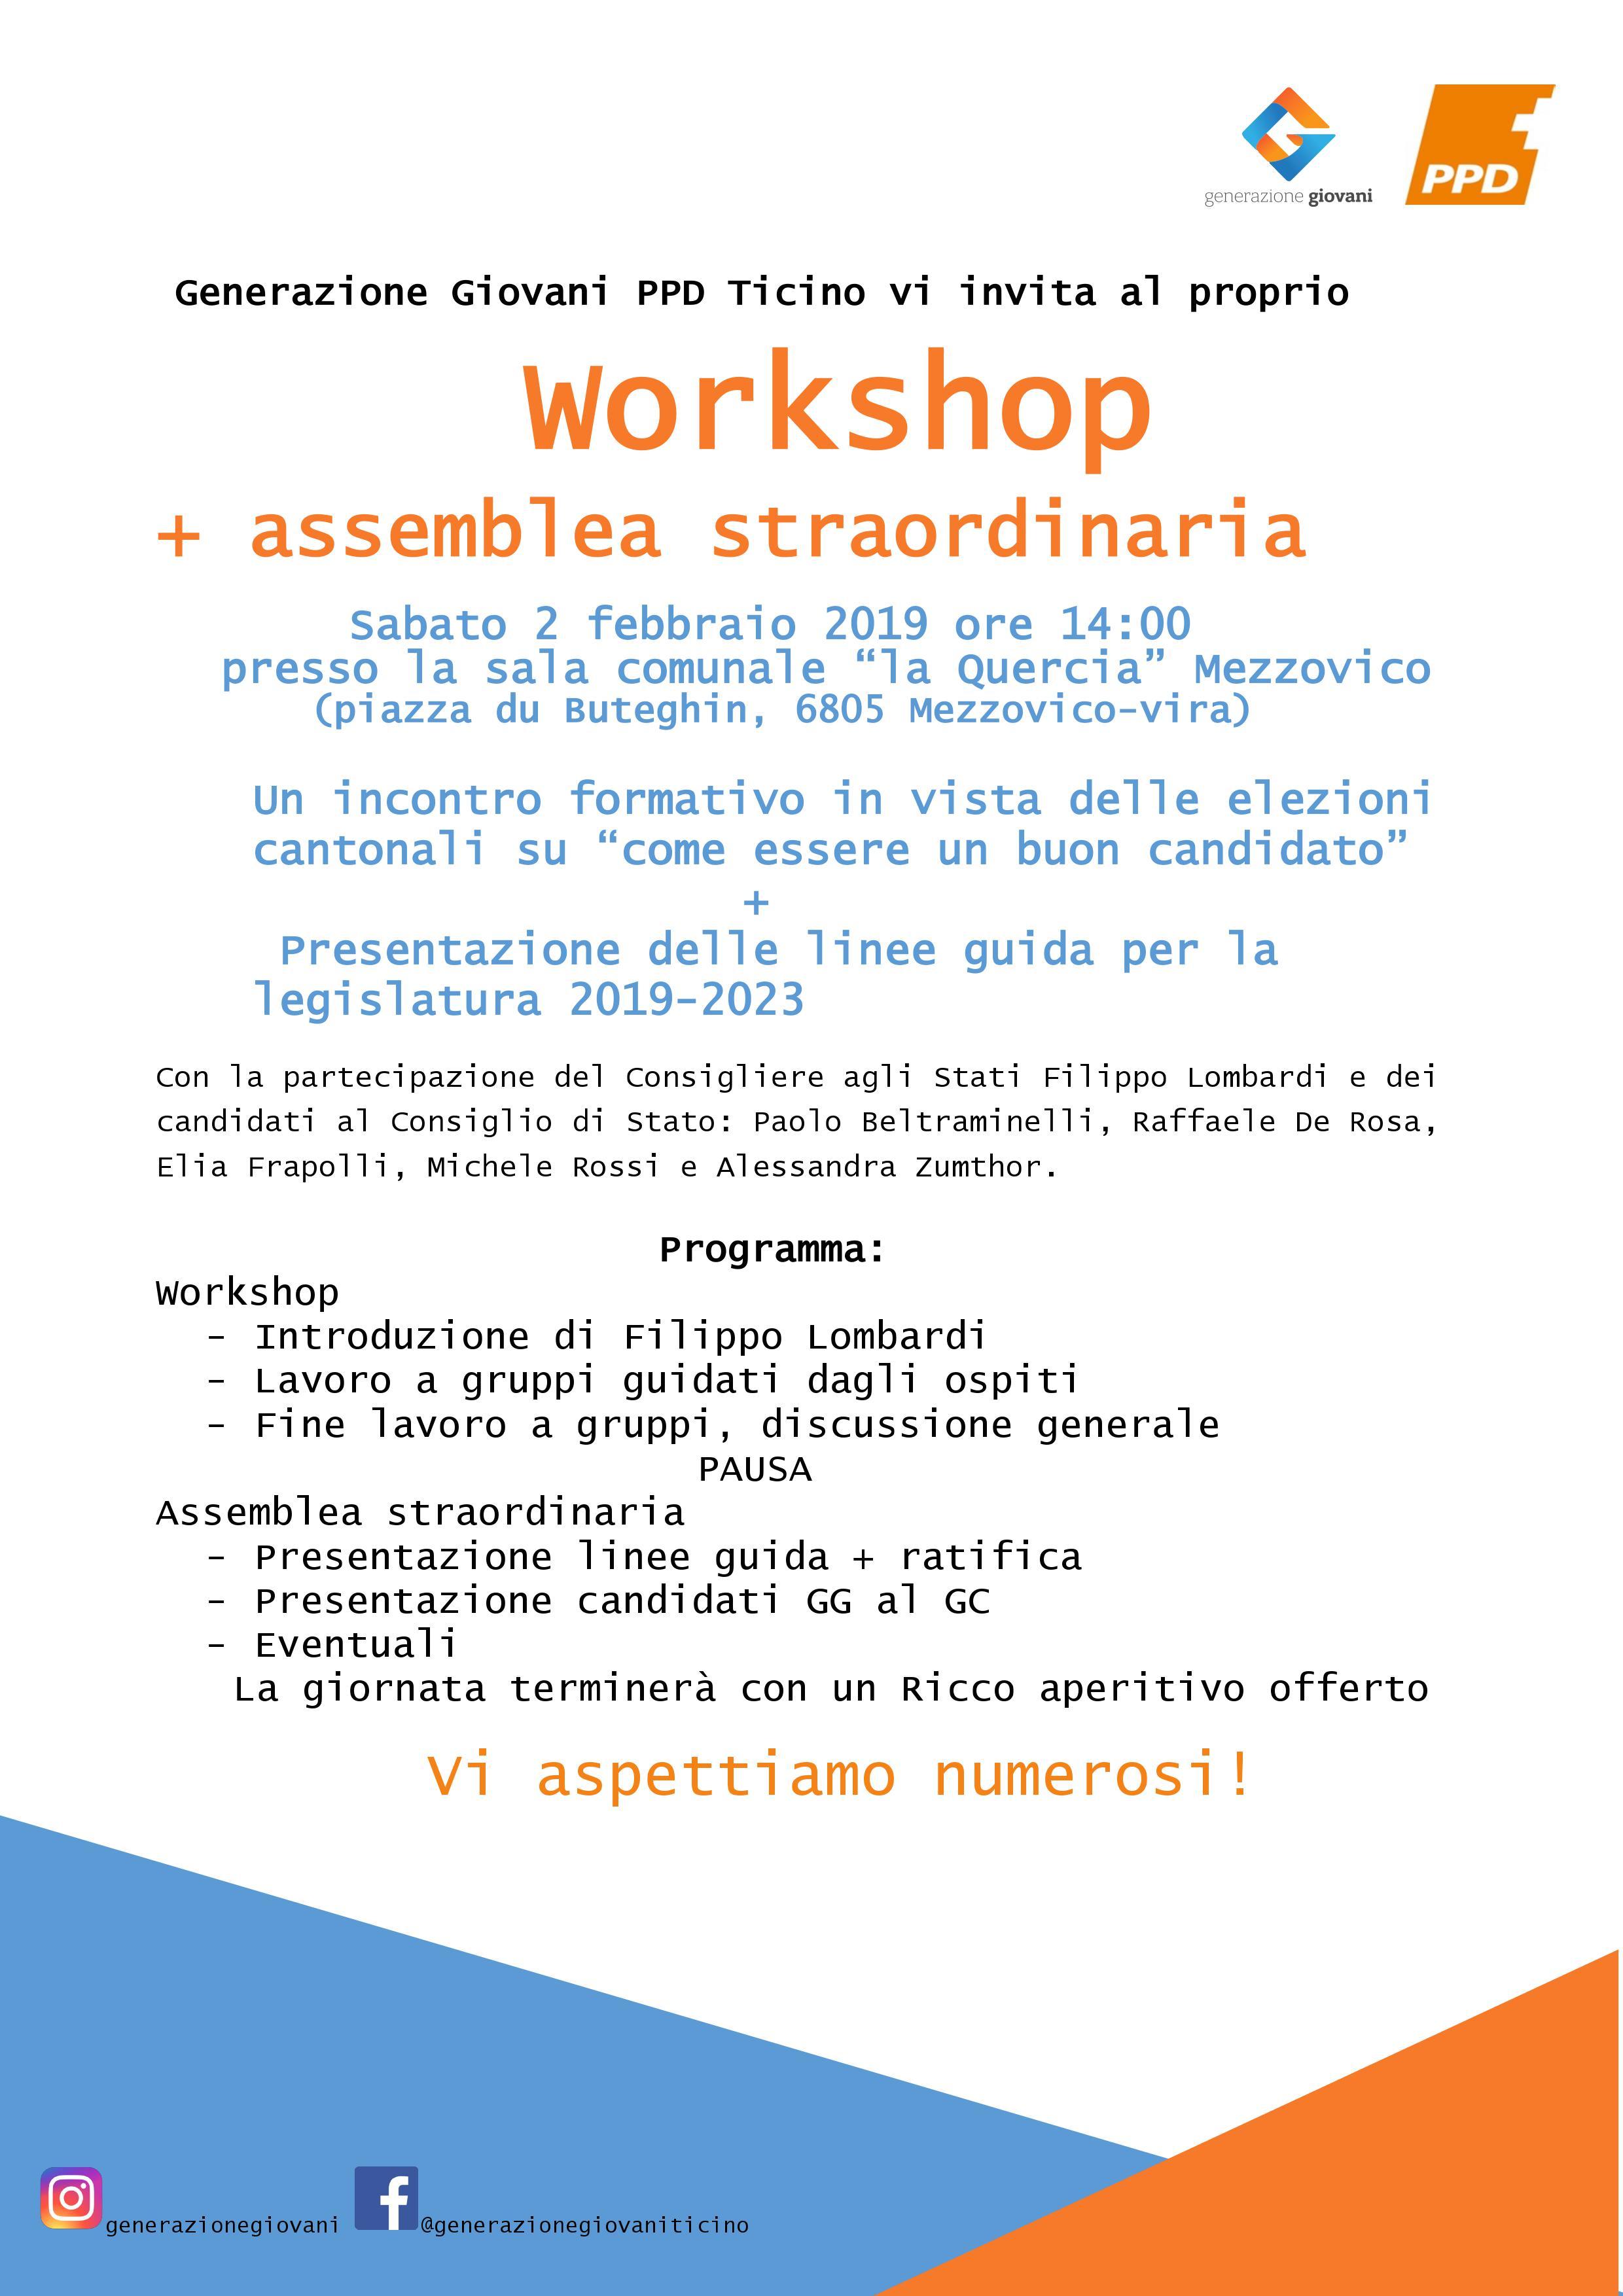 Invito_workshop_2.1.19-1.jpg